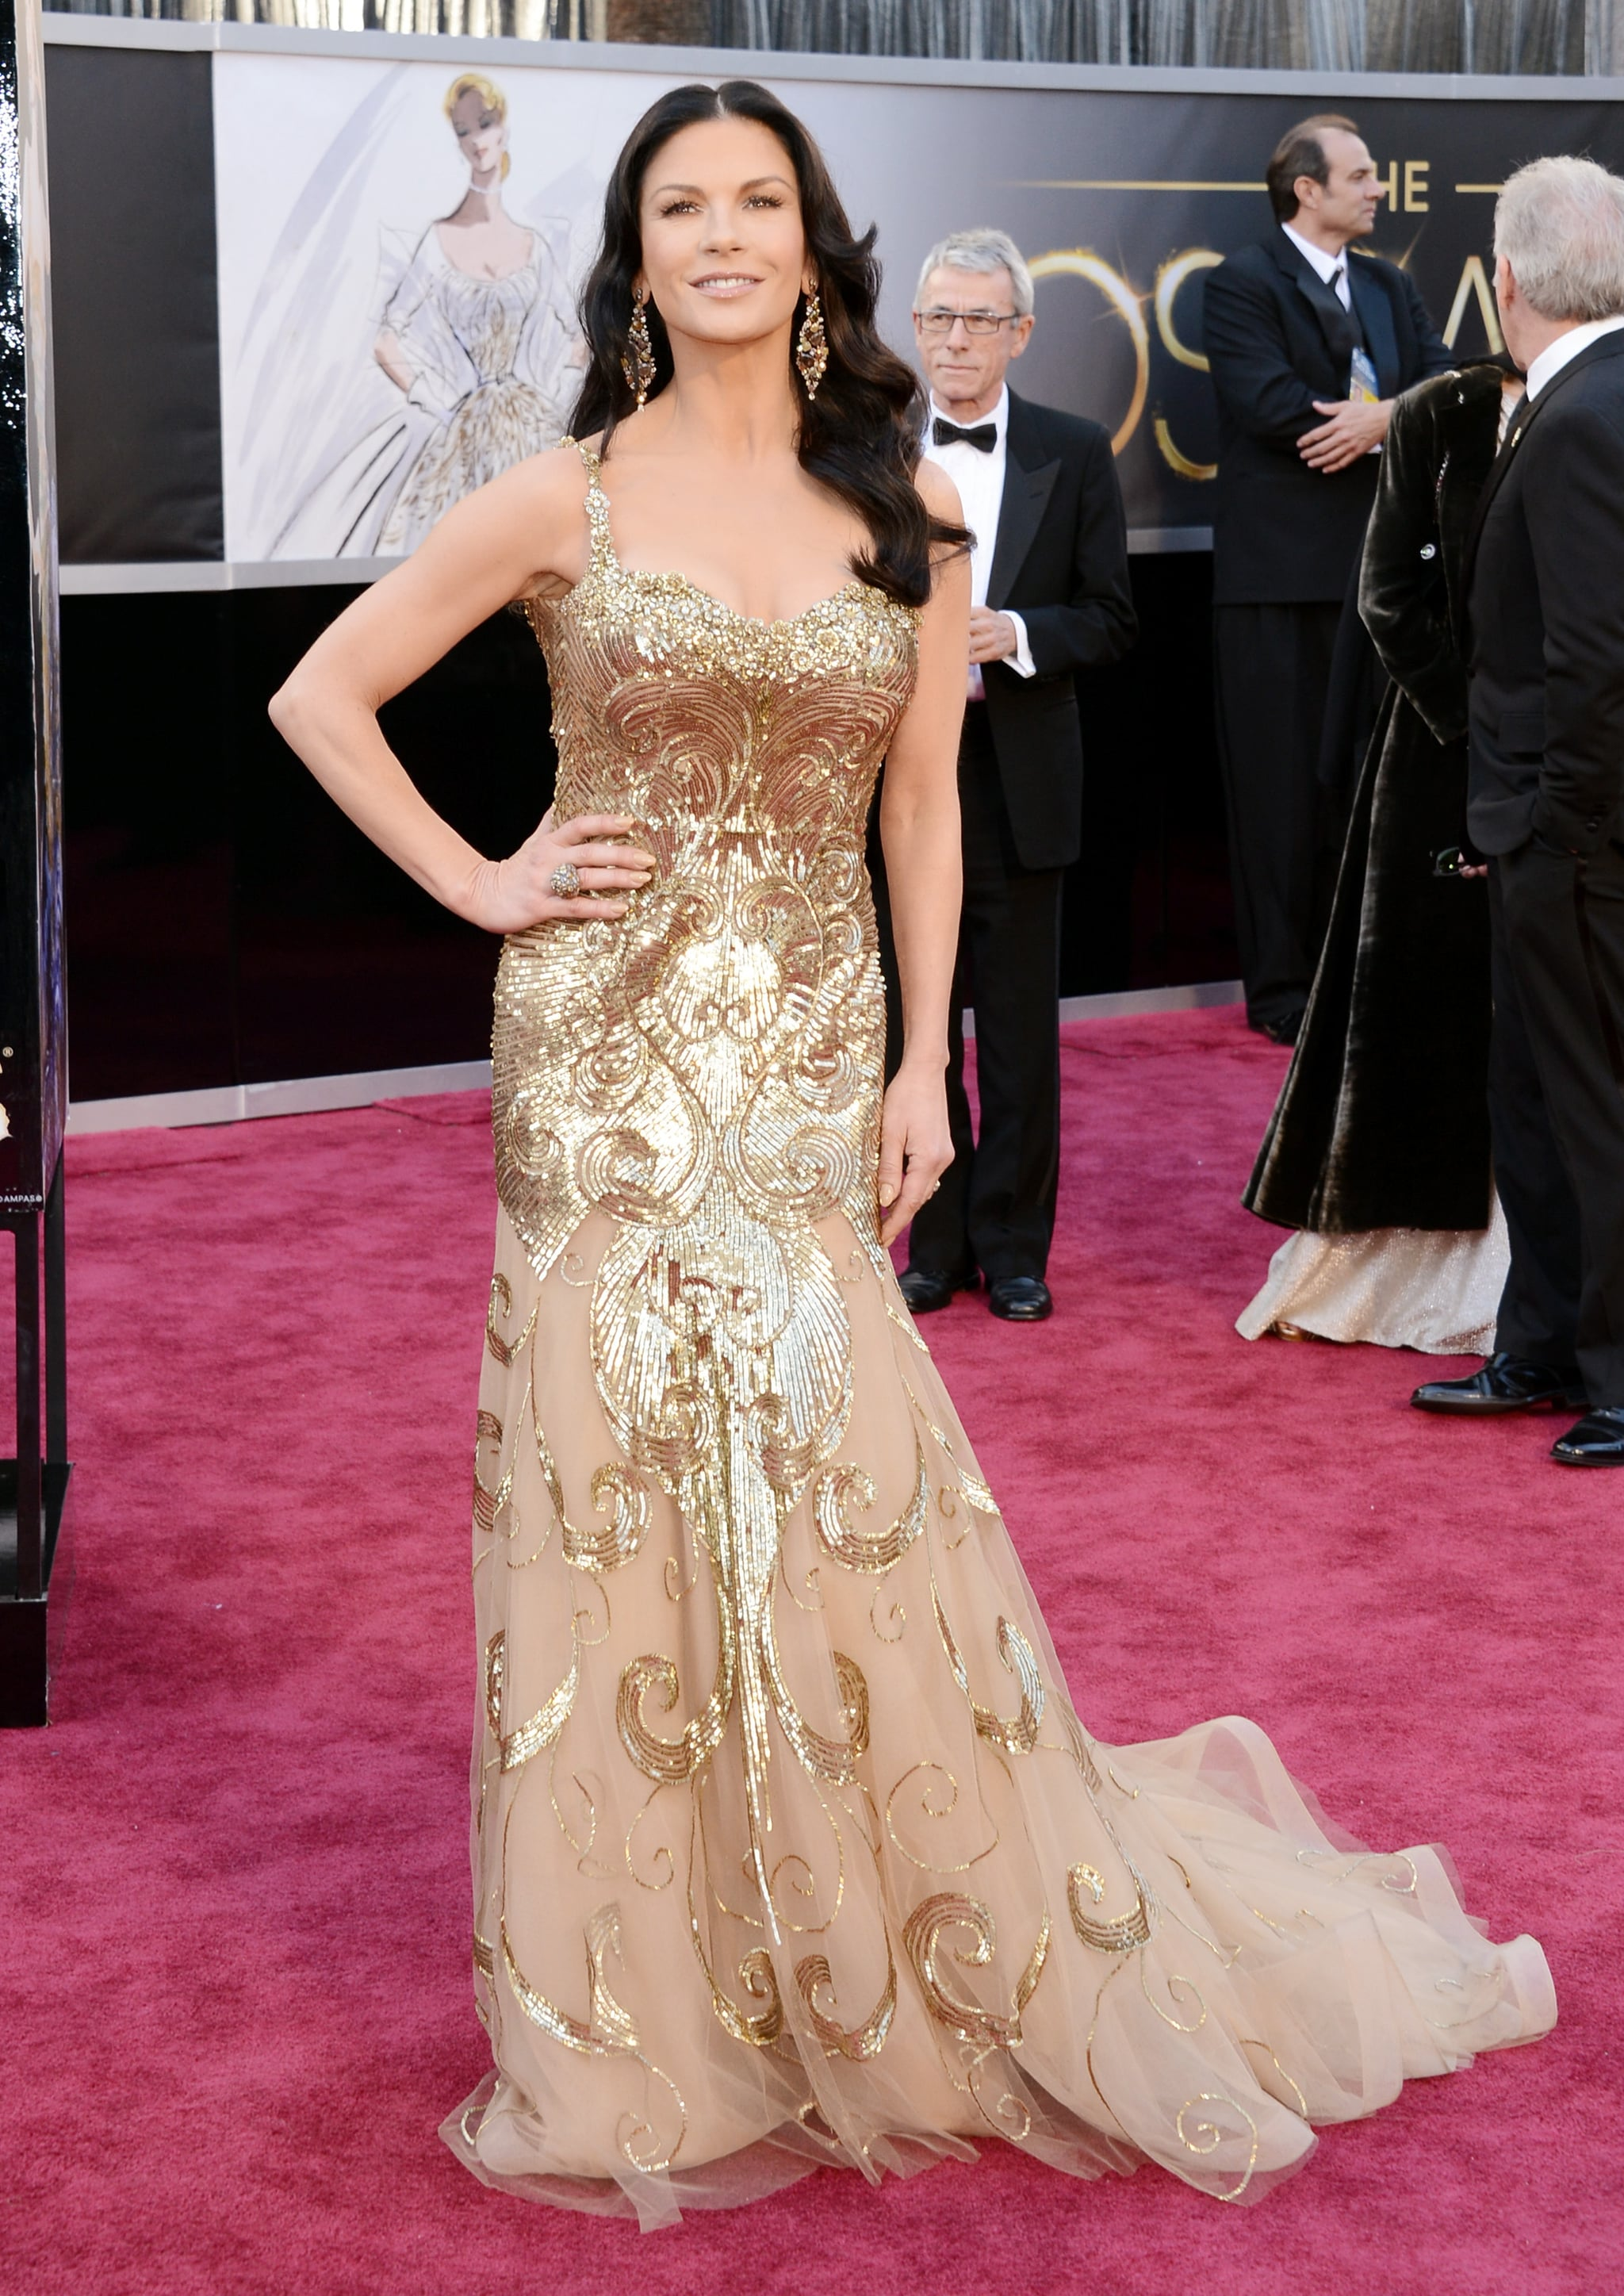 Catherine Zeta-Jones on the red carpet at the Oscars 2013.